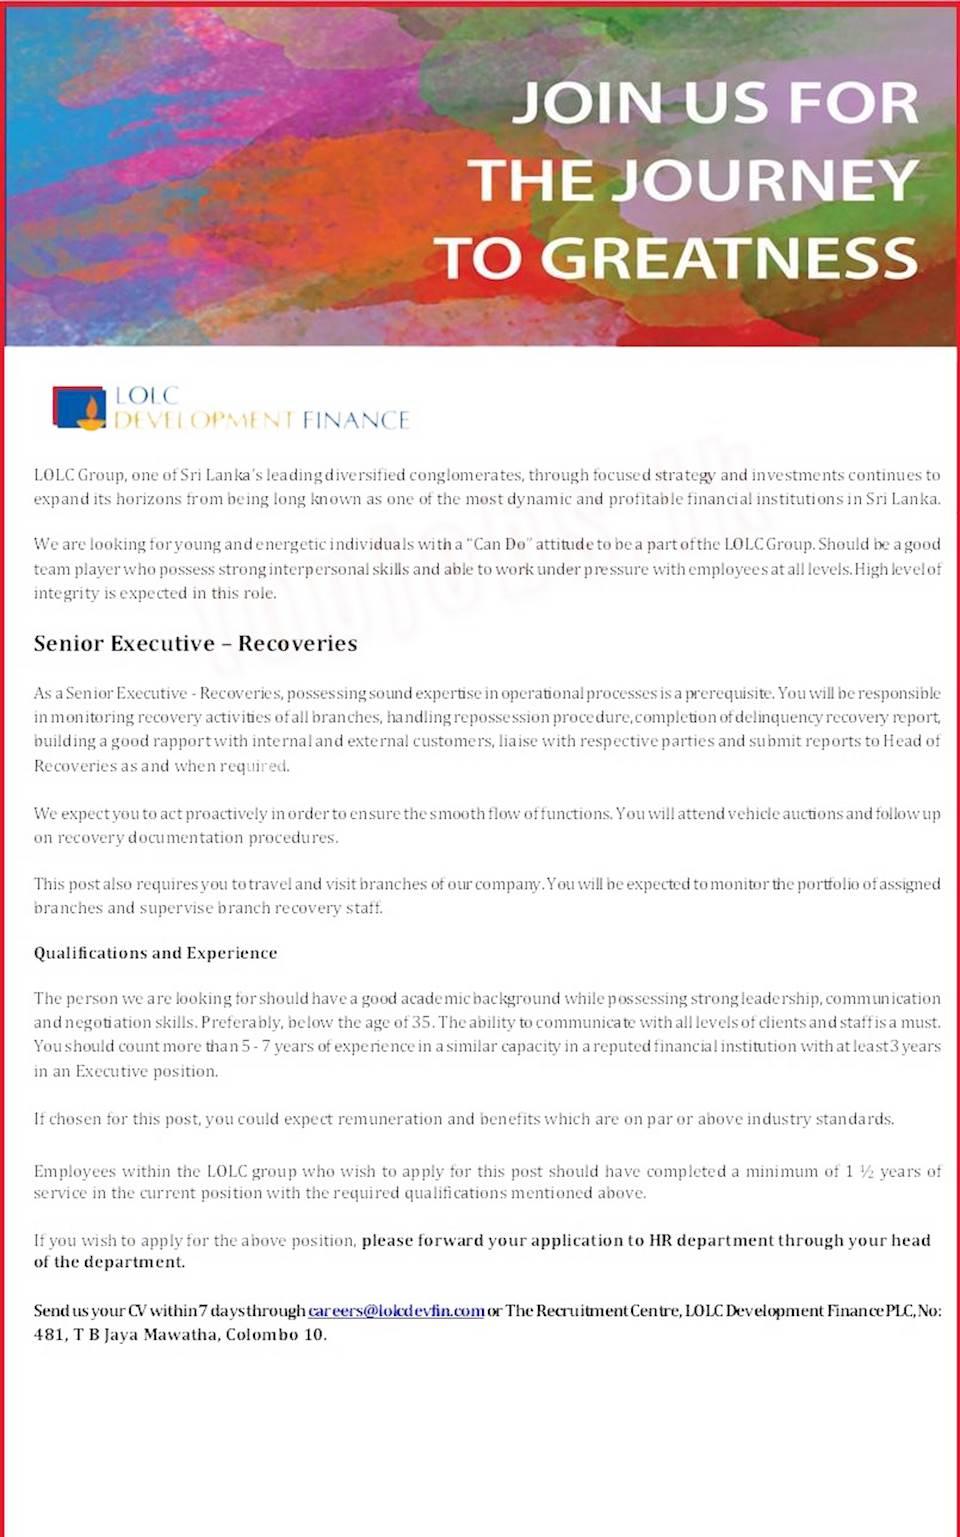 Senior Executive - Recoveries